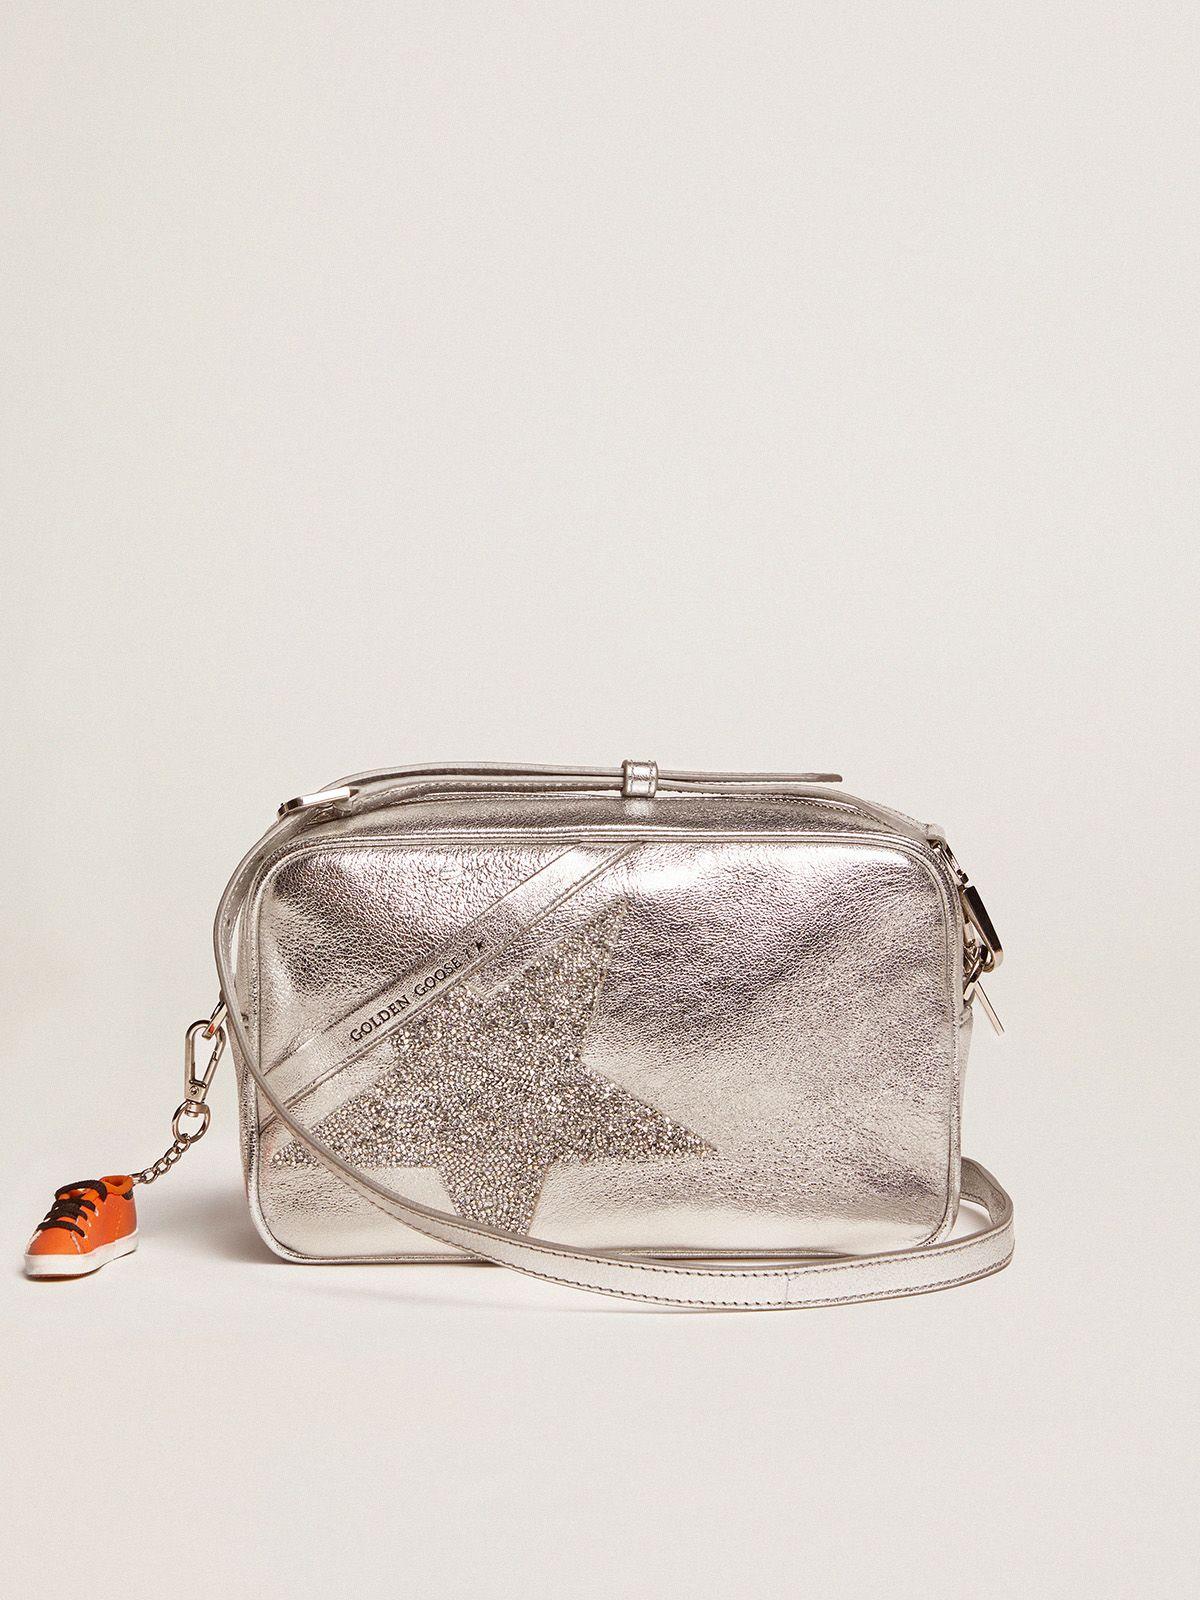 Borsa Star Bag argentata in pelle laminata con stella Swarovski